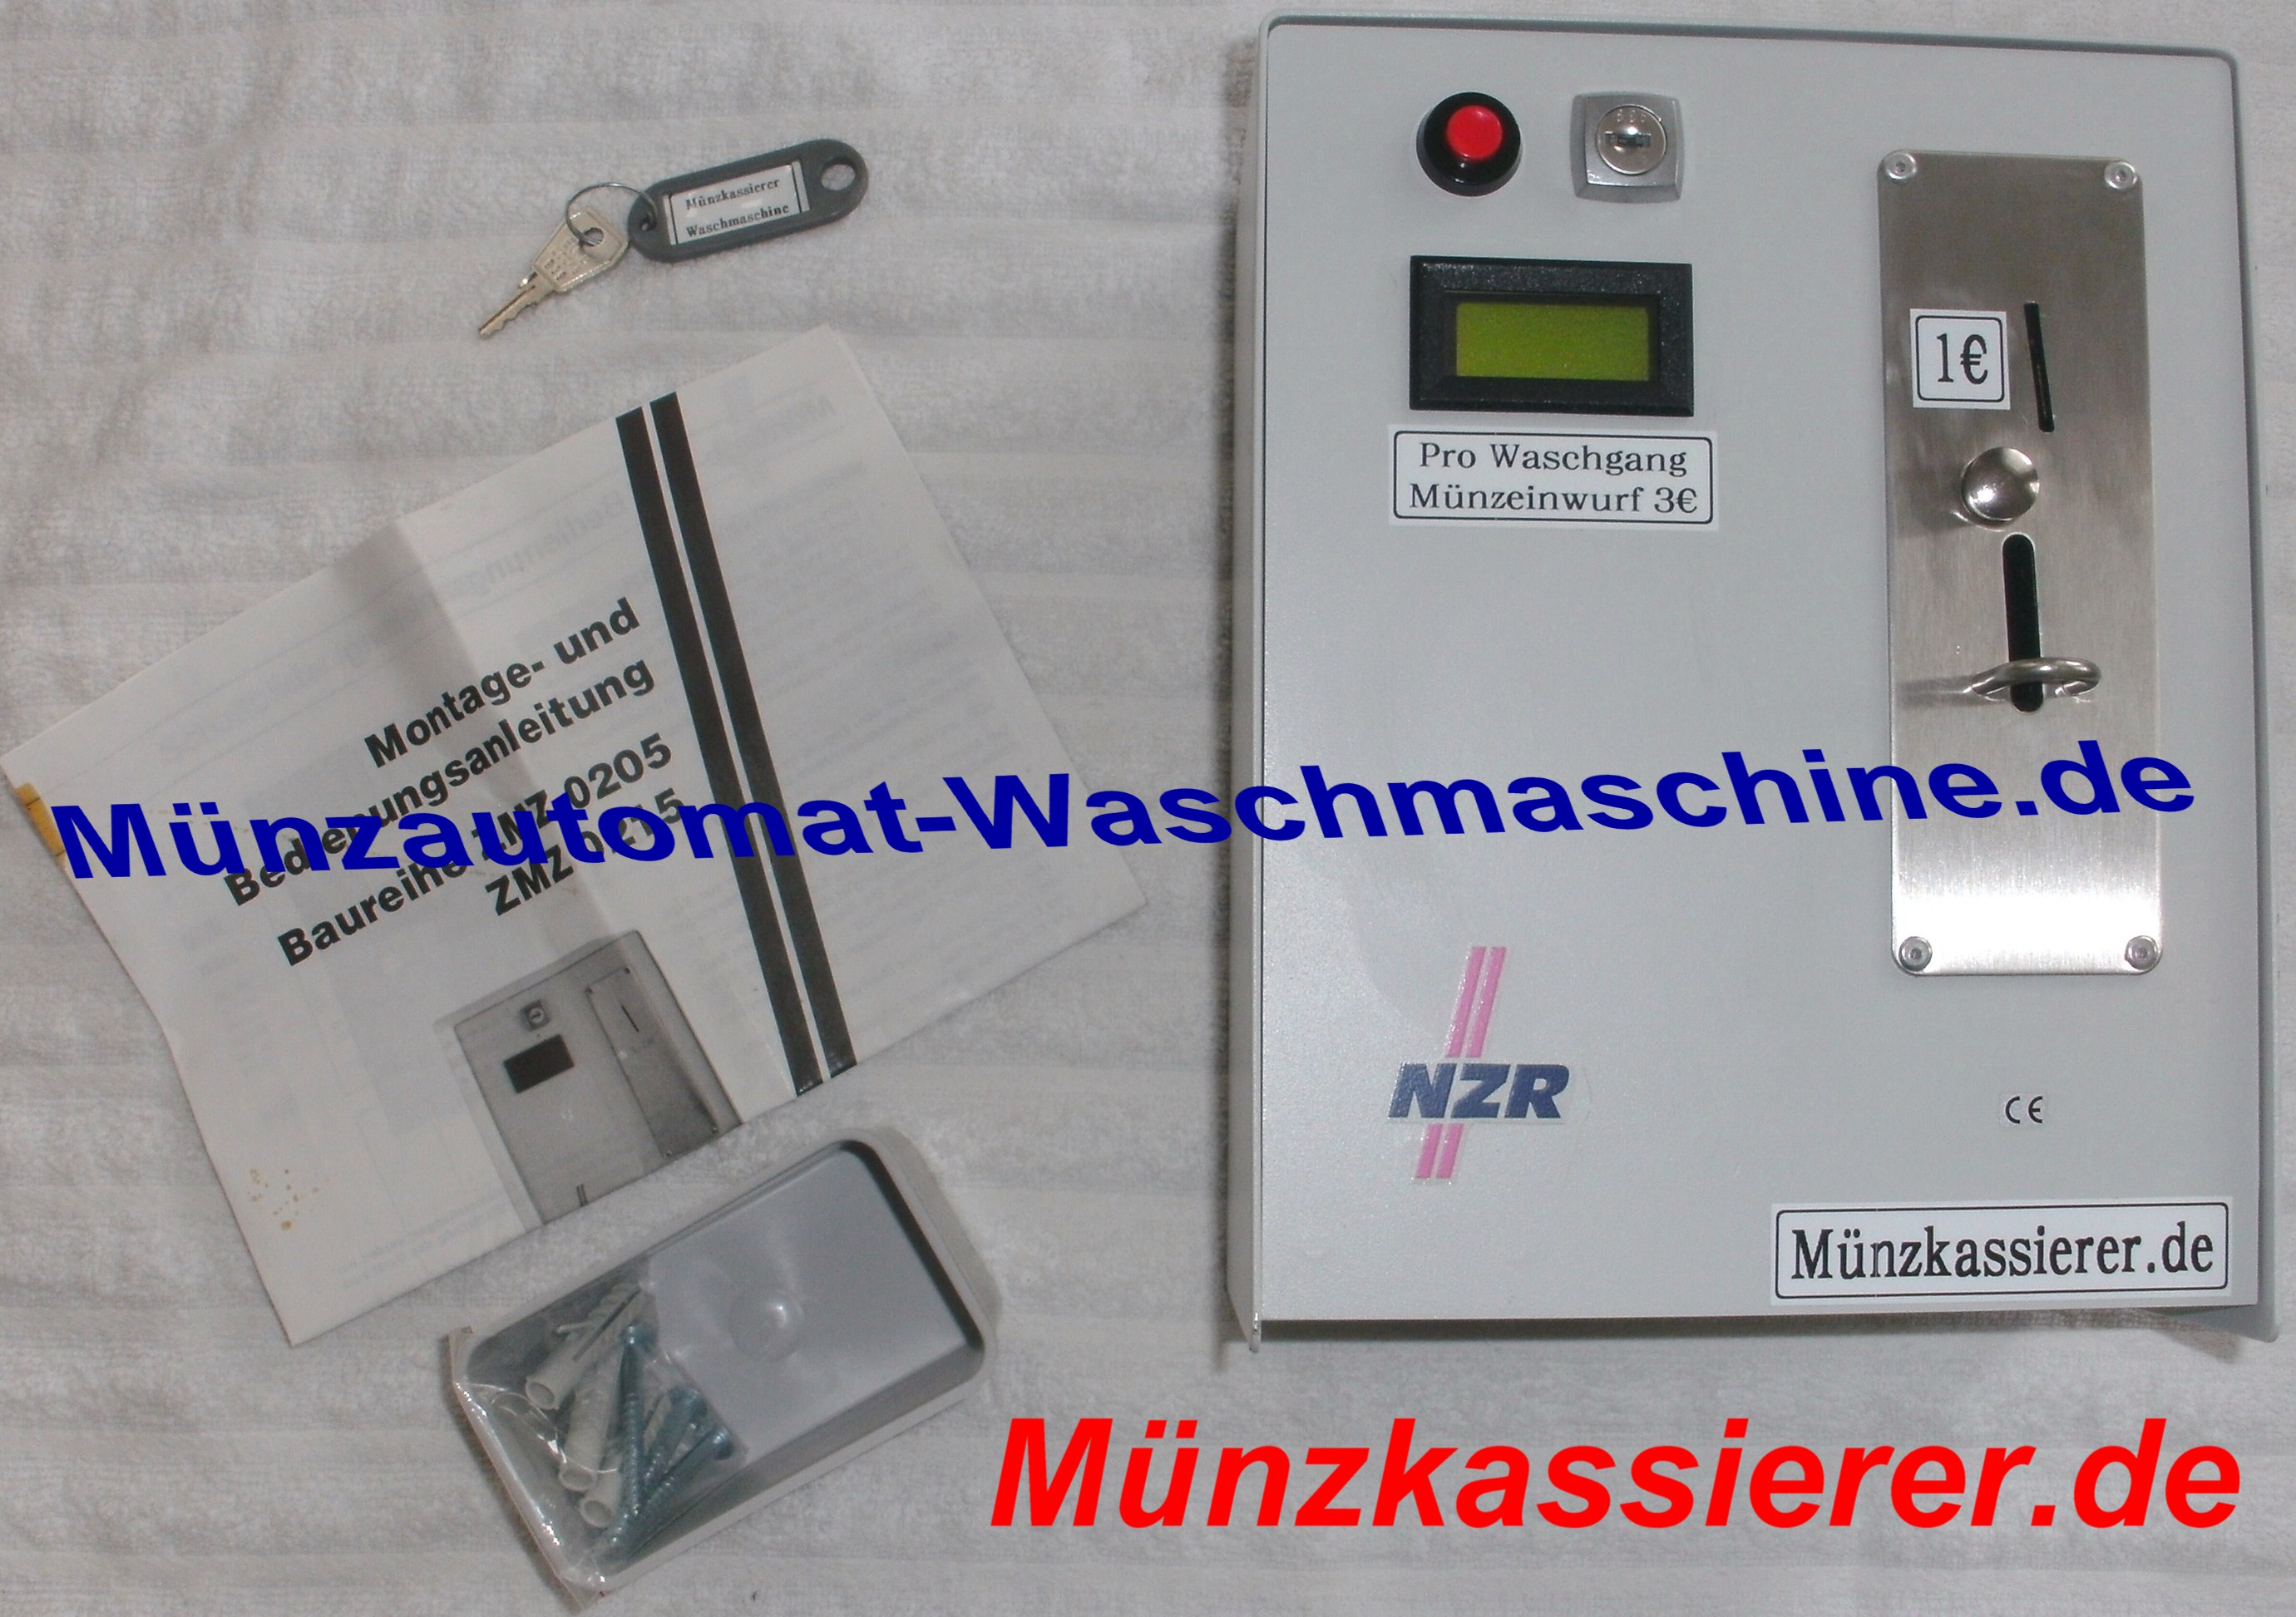 Nzr zmz münzautomat waschmaschine trockner